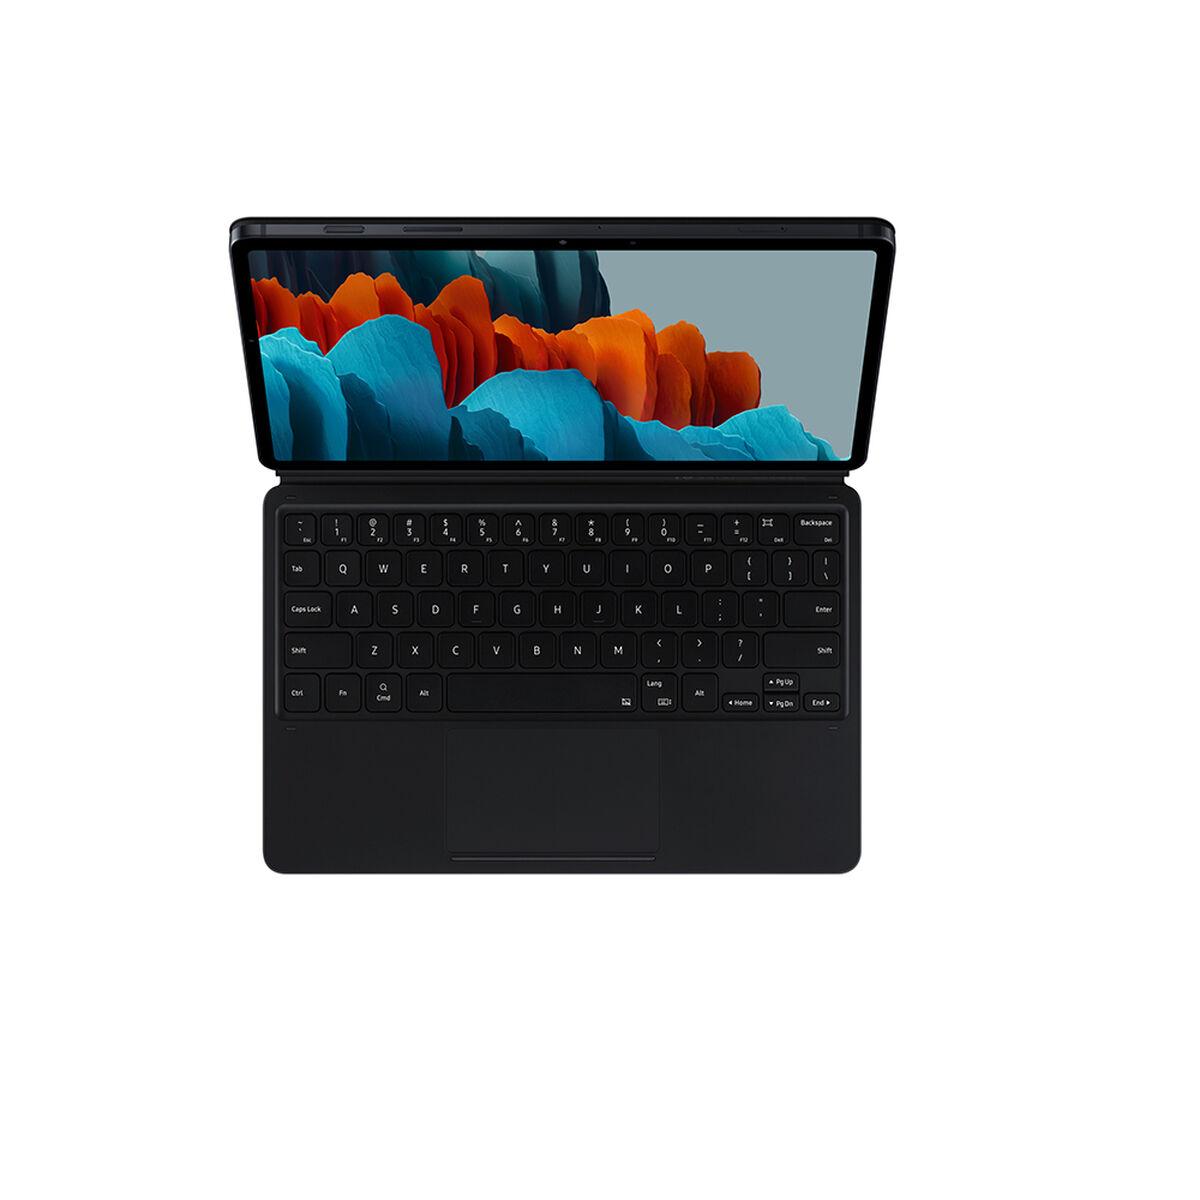 "Tablet Samsung SM-T870 Galaxy Tab S7 6GB 128GB 11"" Wifi Mystic Black + Keyboard + Cover + S-Pen"